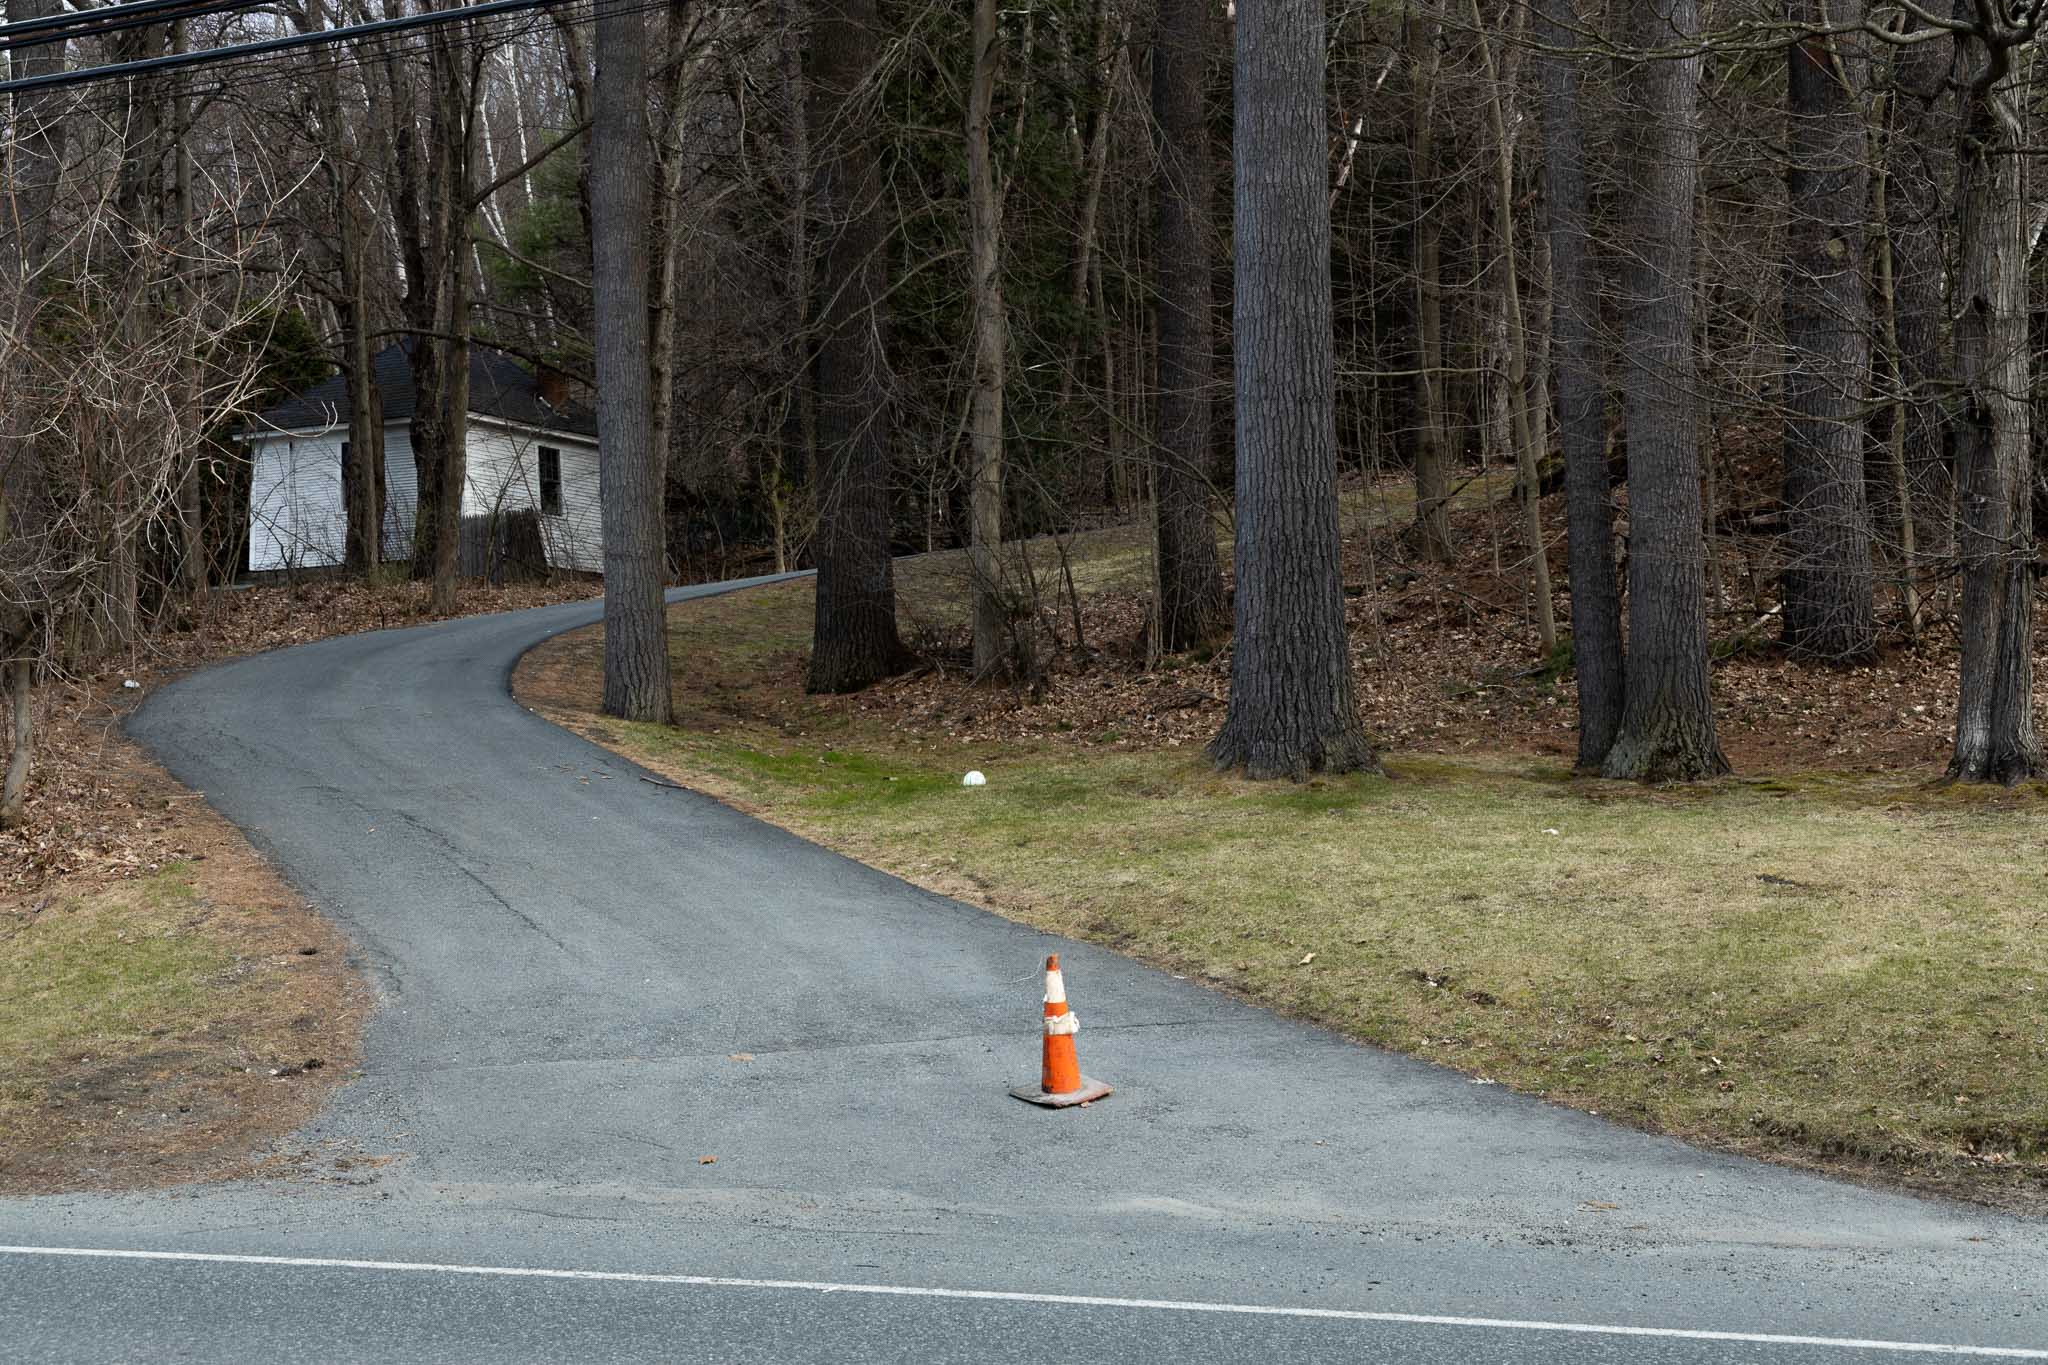 Cone in Driveway